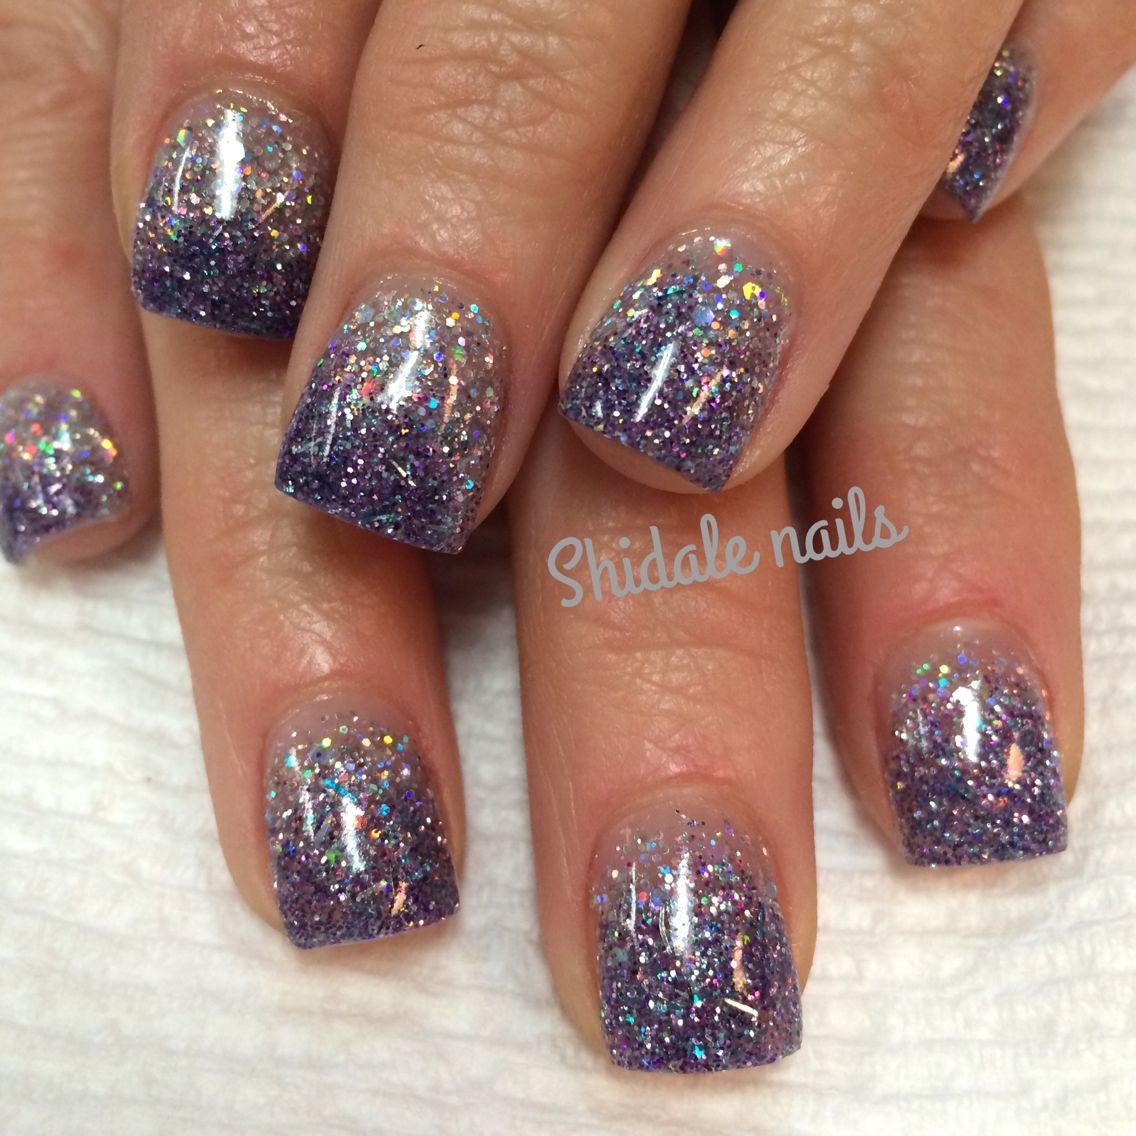 Glitter Nail Designs For Short Nails  Short square acrylics Glitter ombre nails Shidale nails